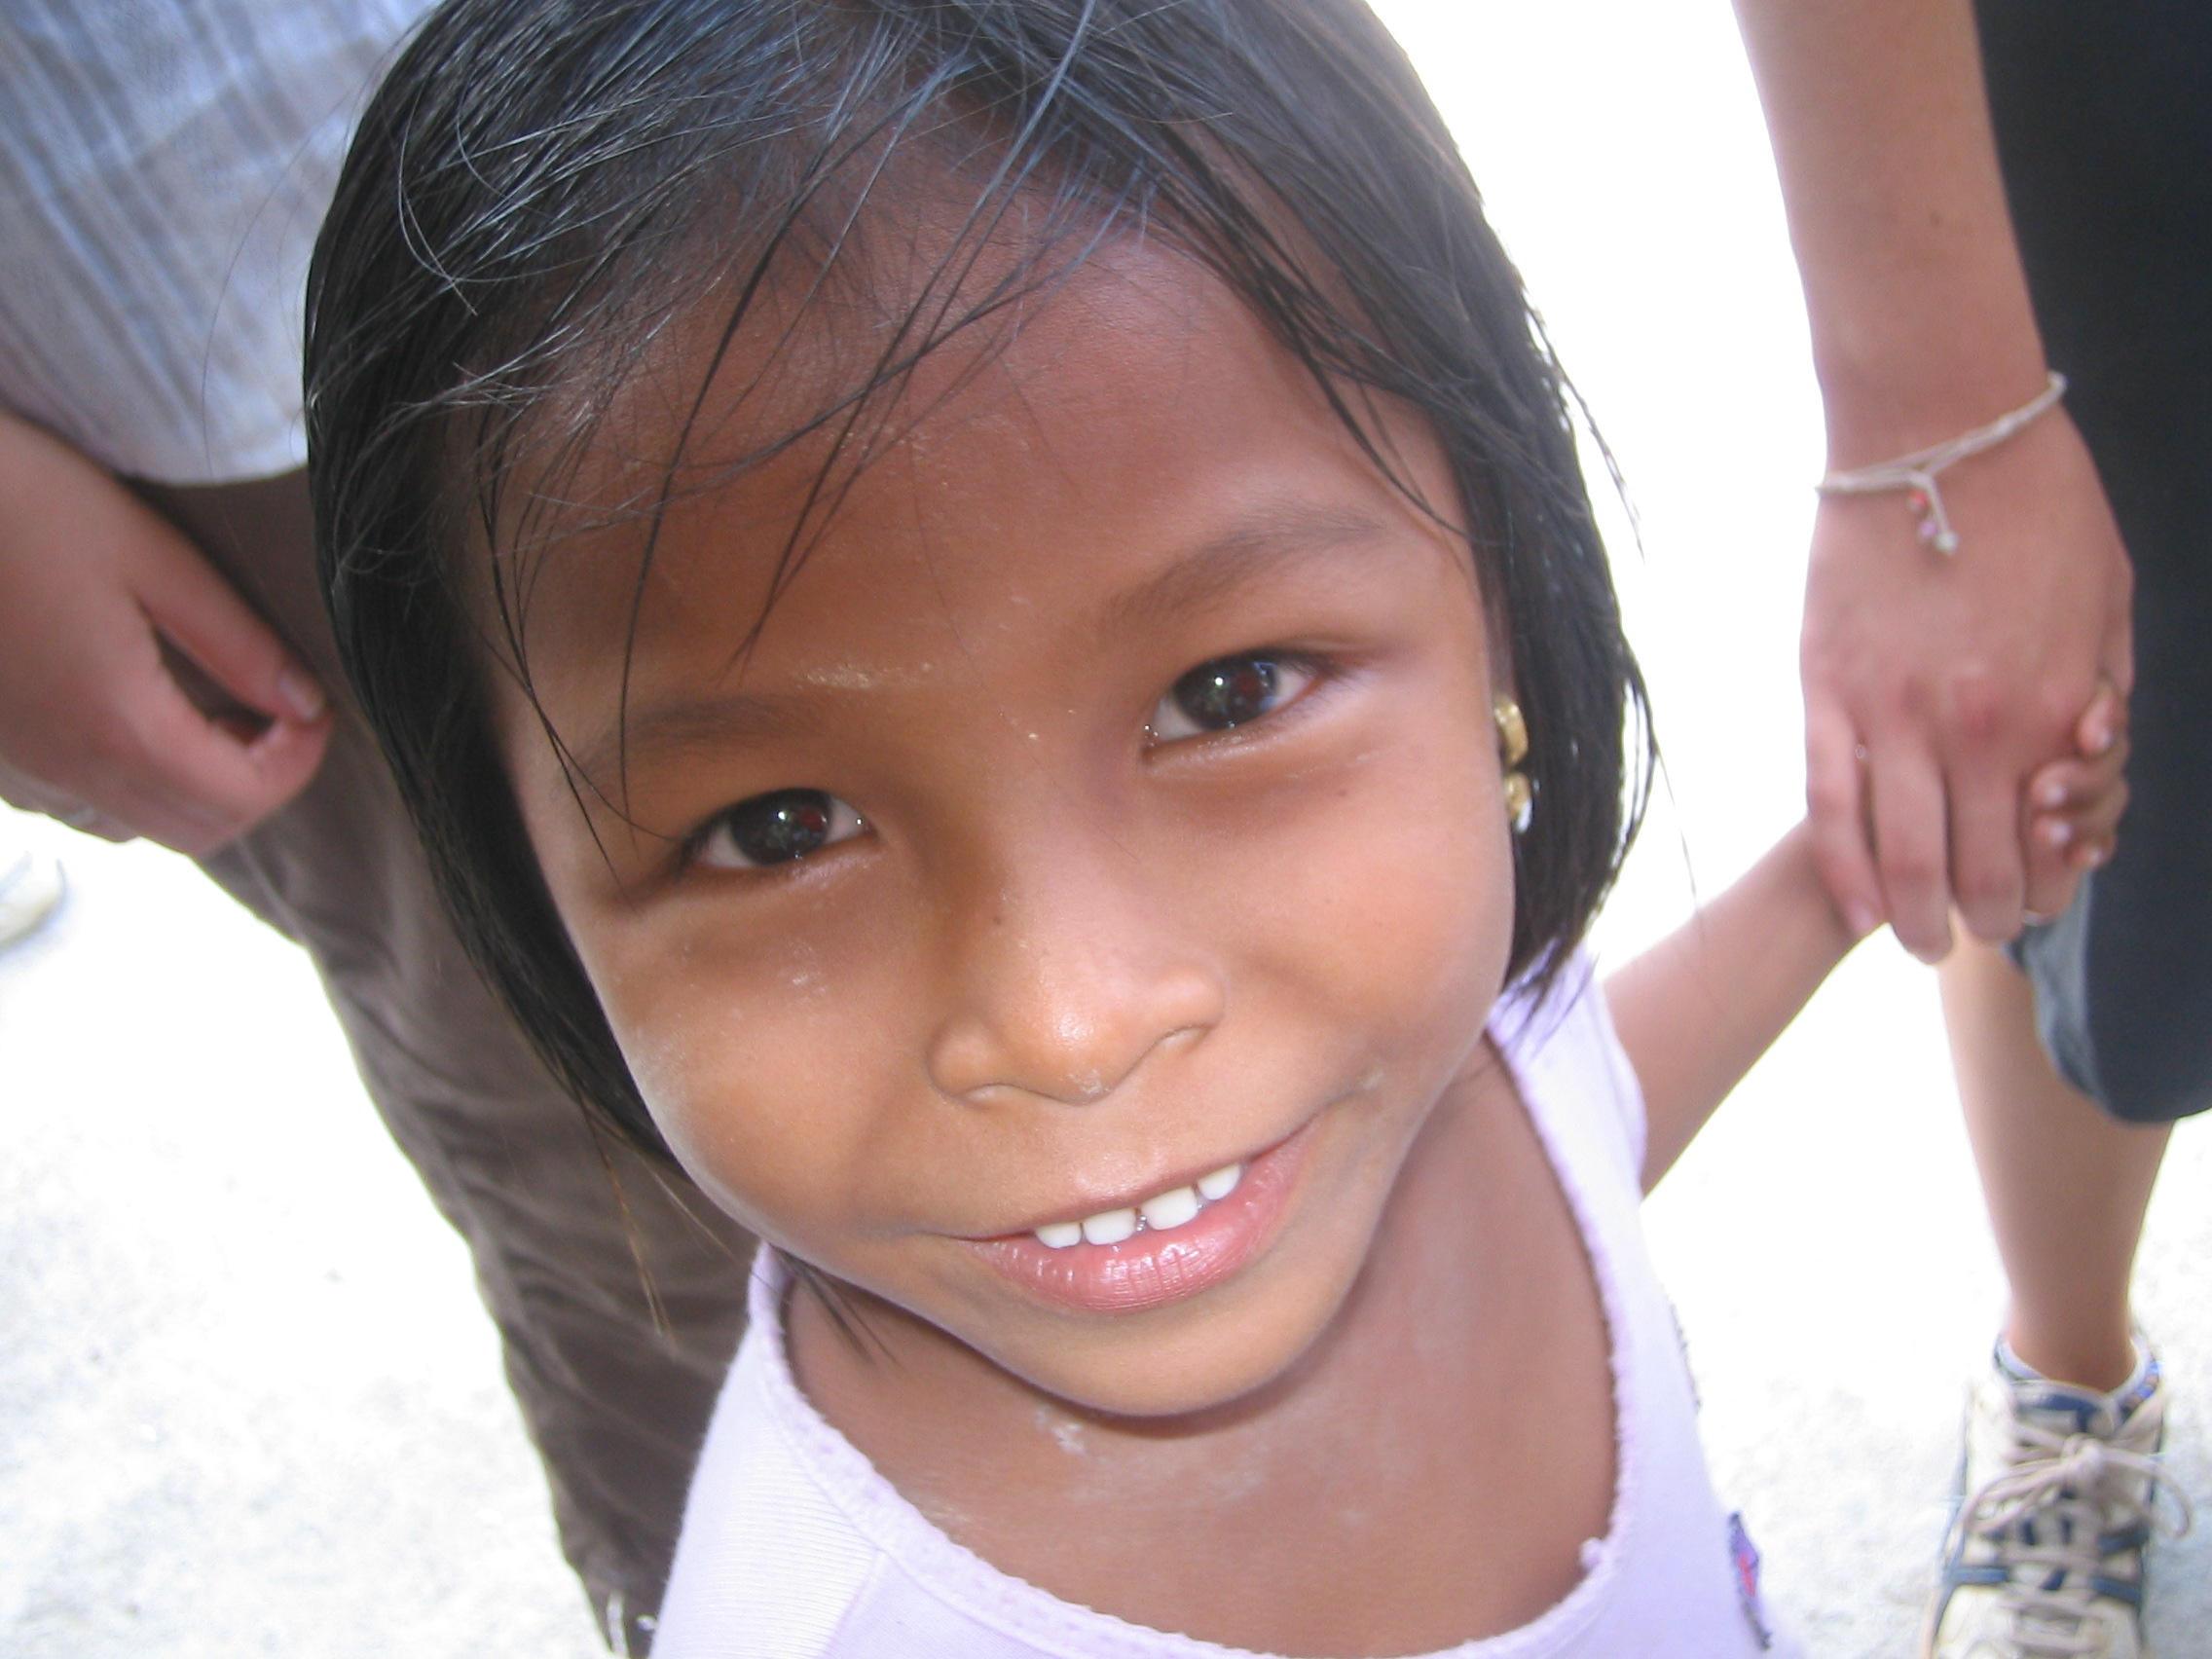 A little thai girl by mandy moo on deviantart for Tiny thai teen